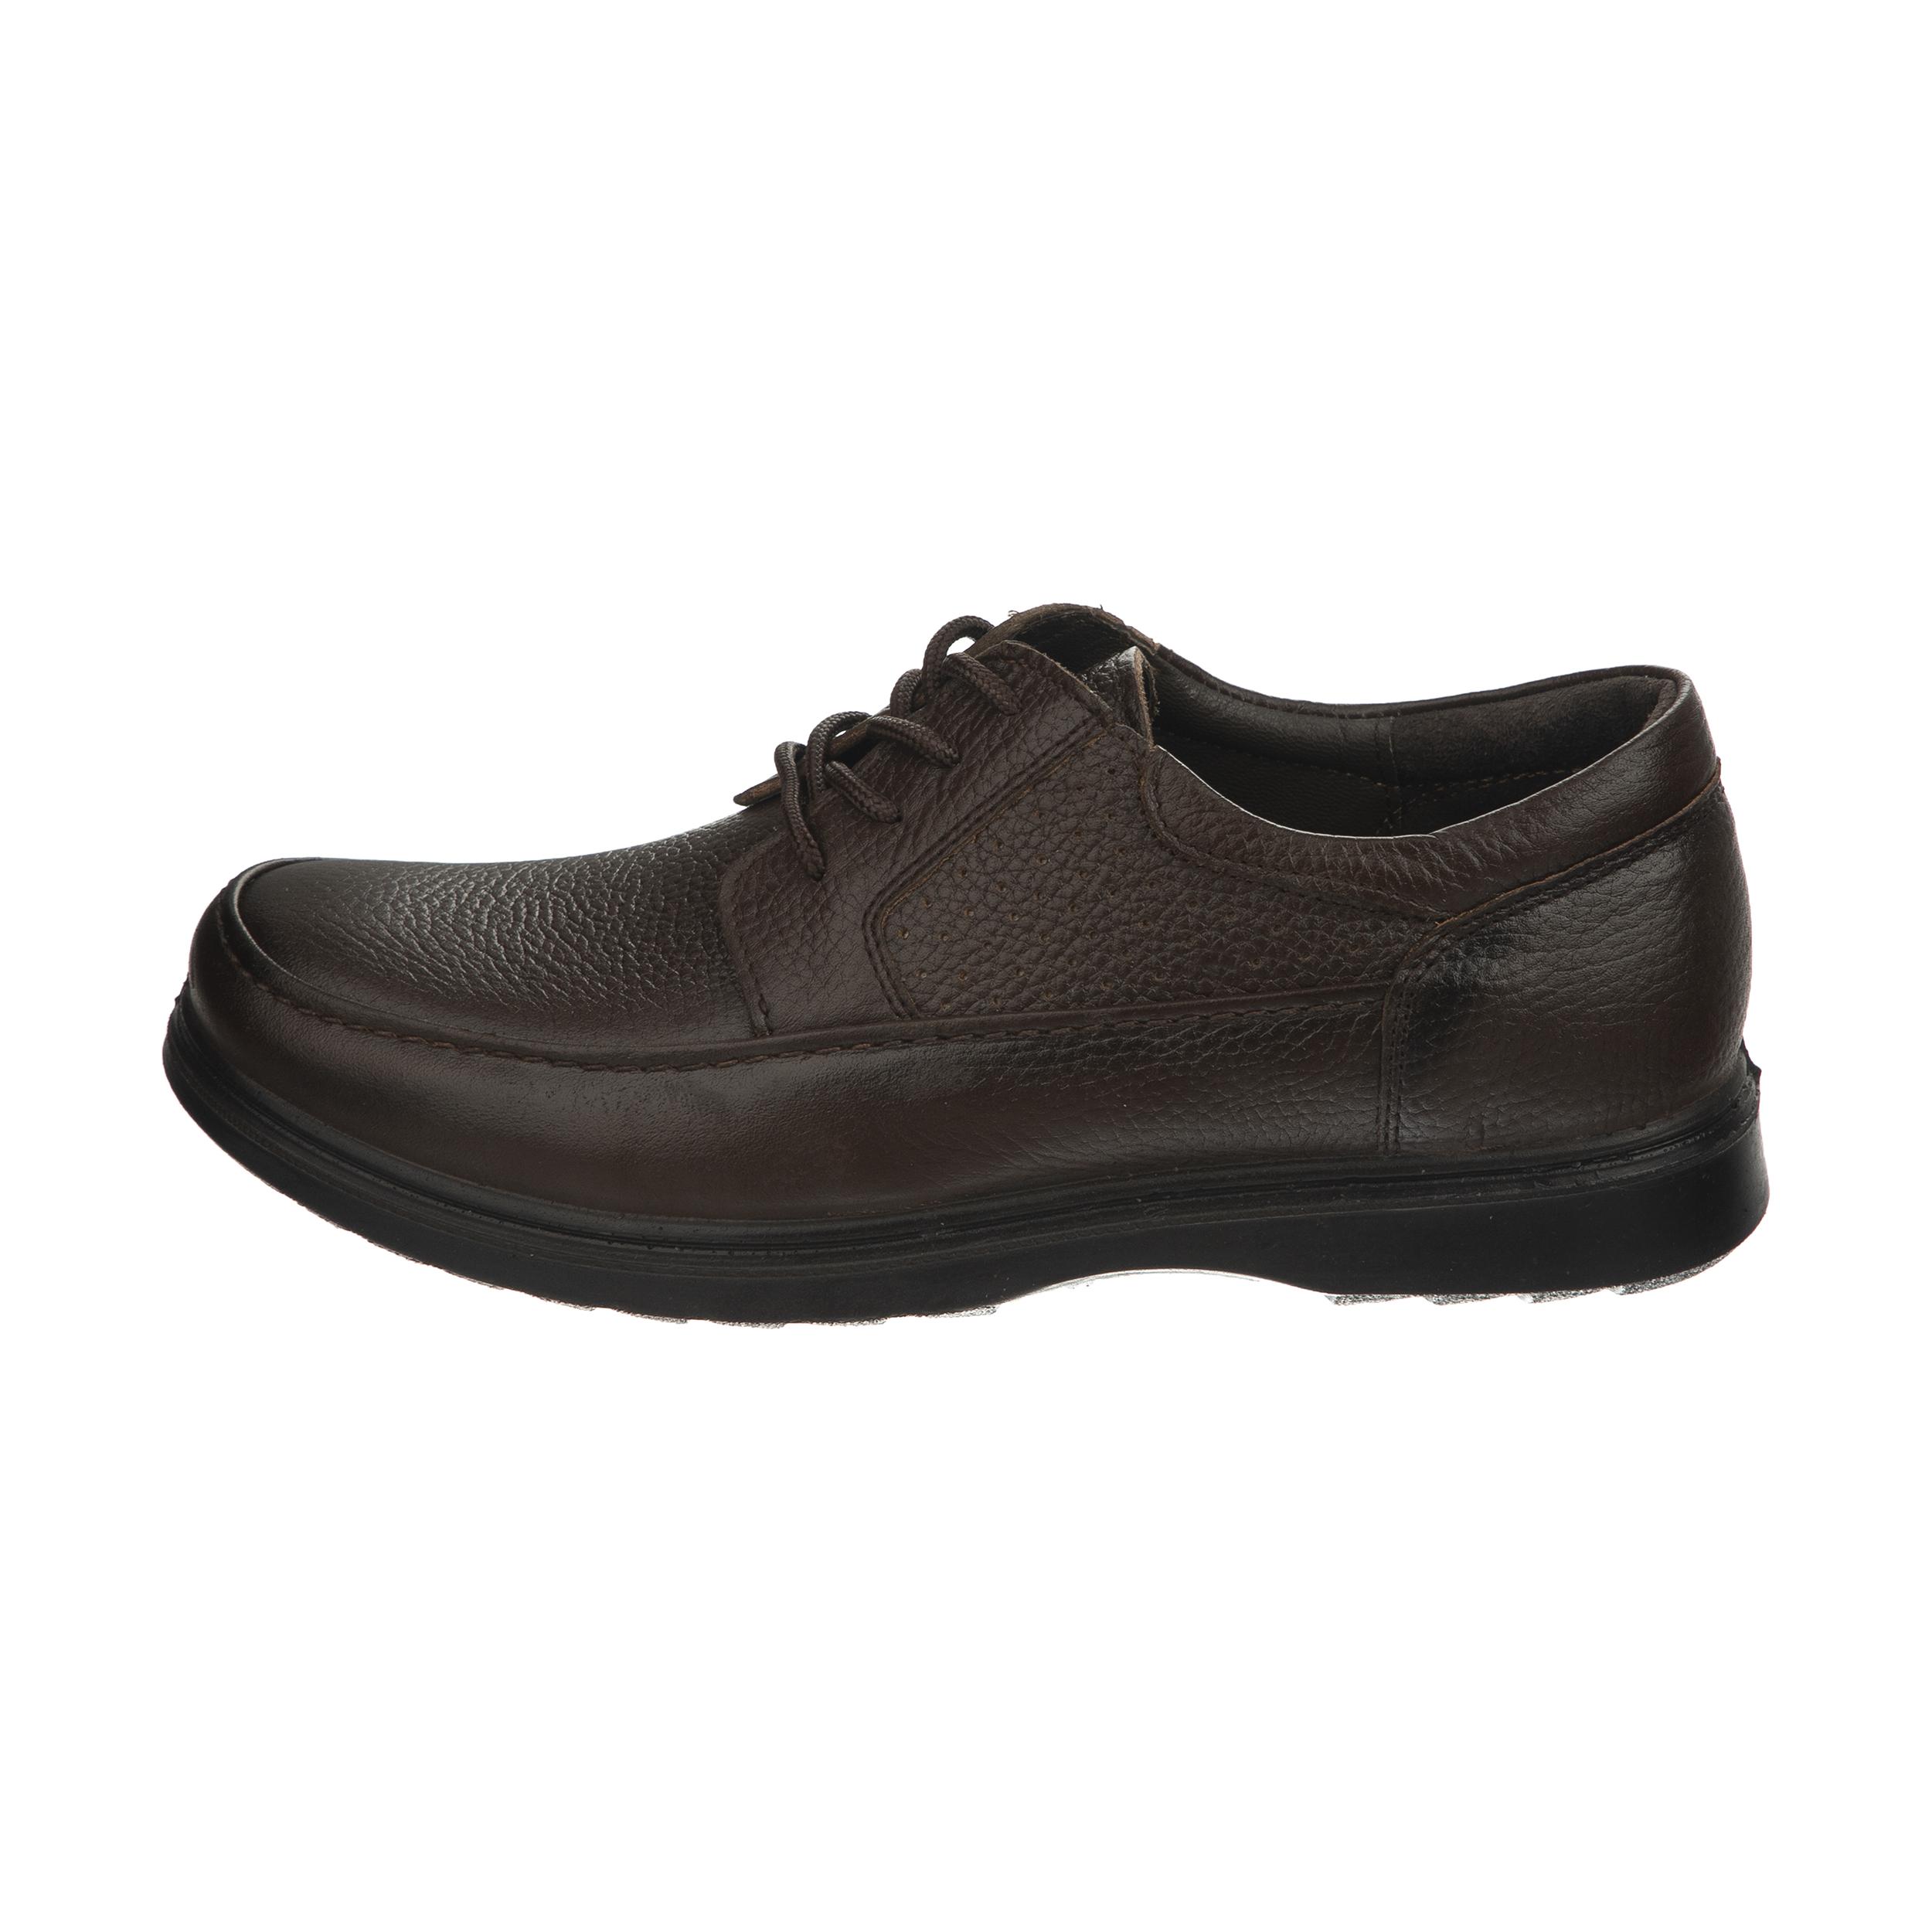 کفش روزمره مردانه آقانژاد مدل 10008-39